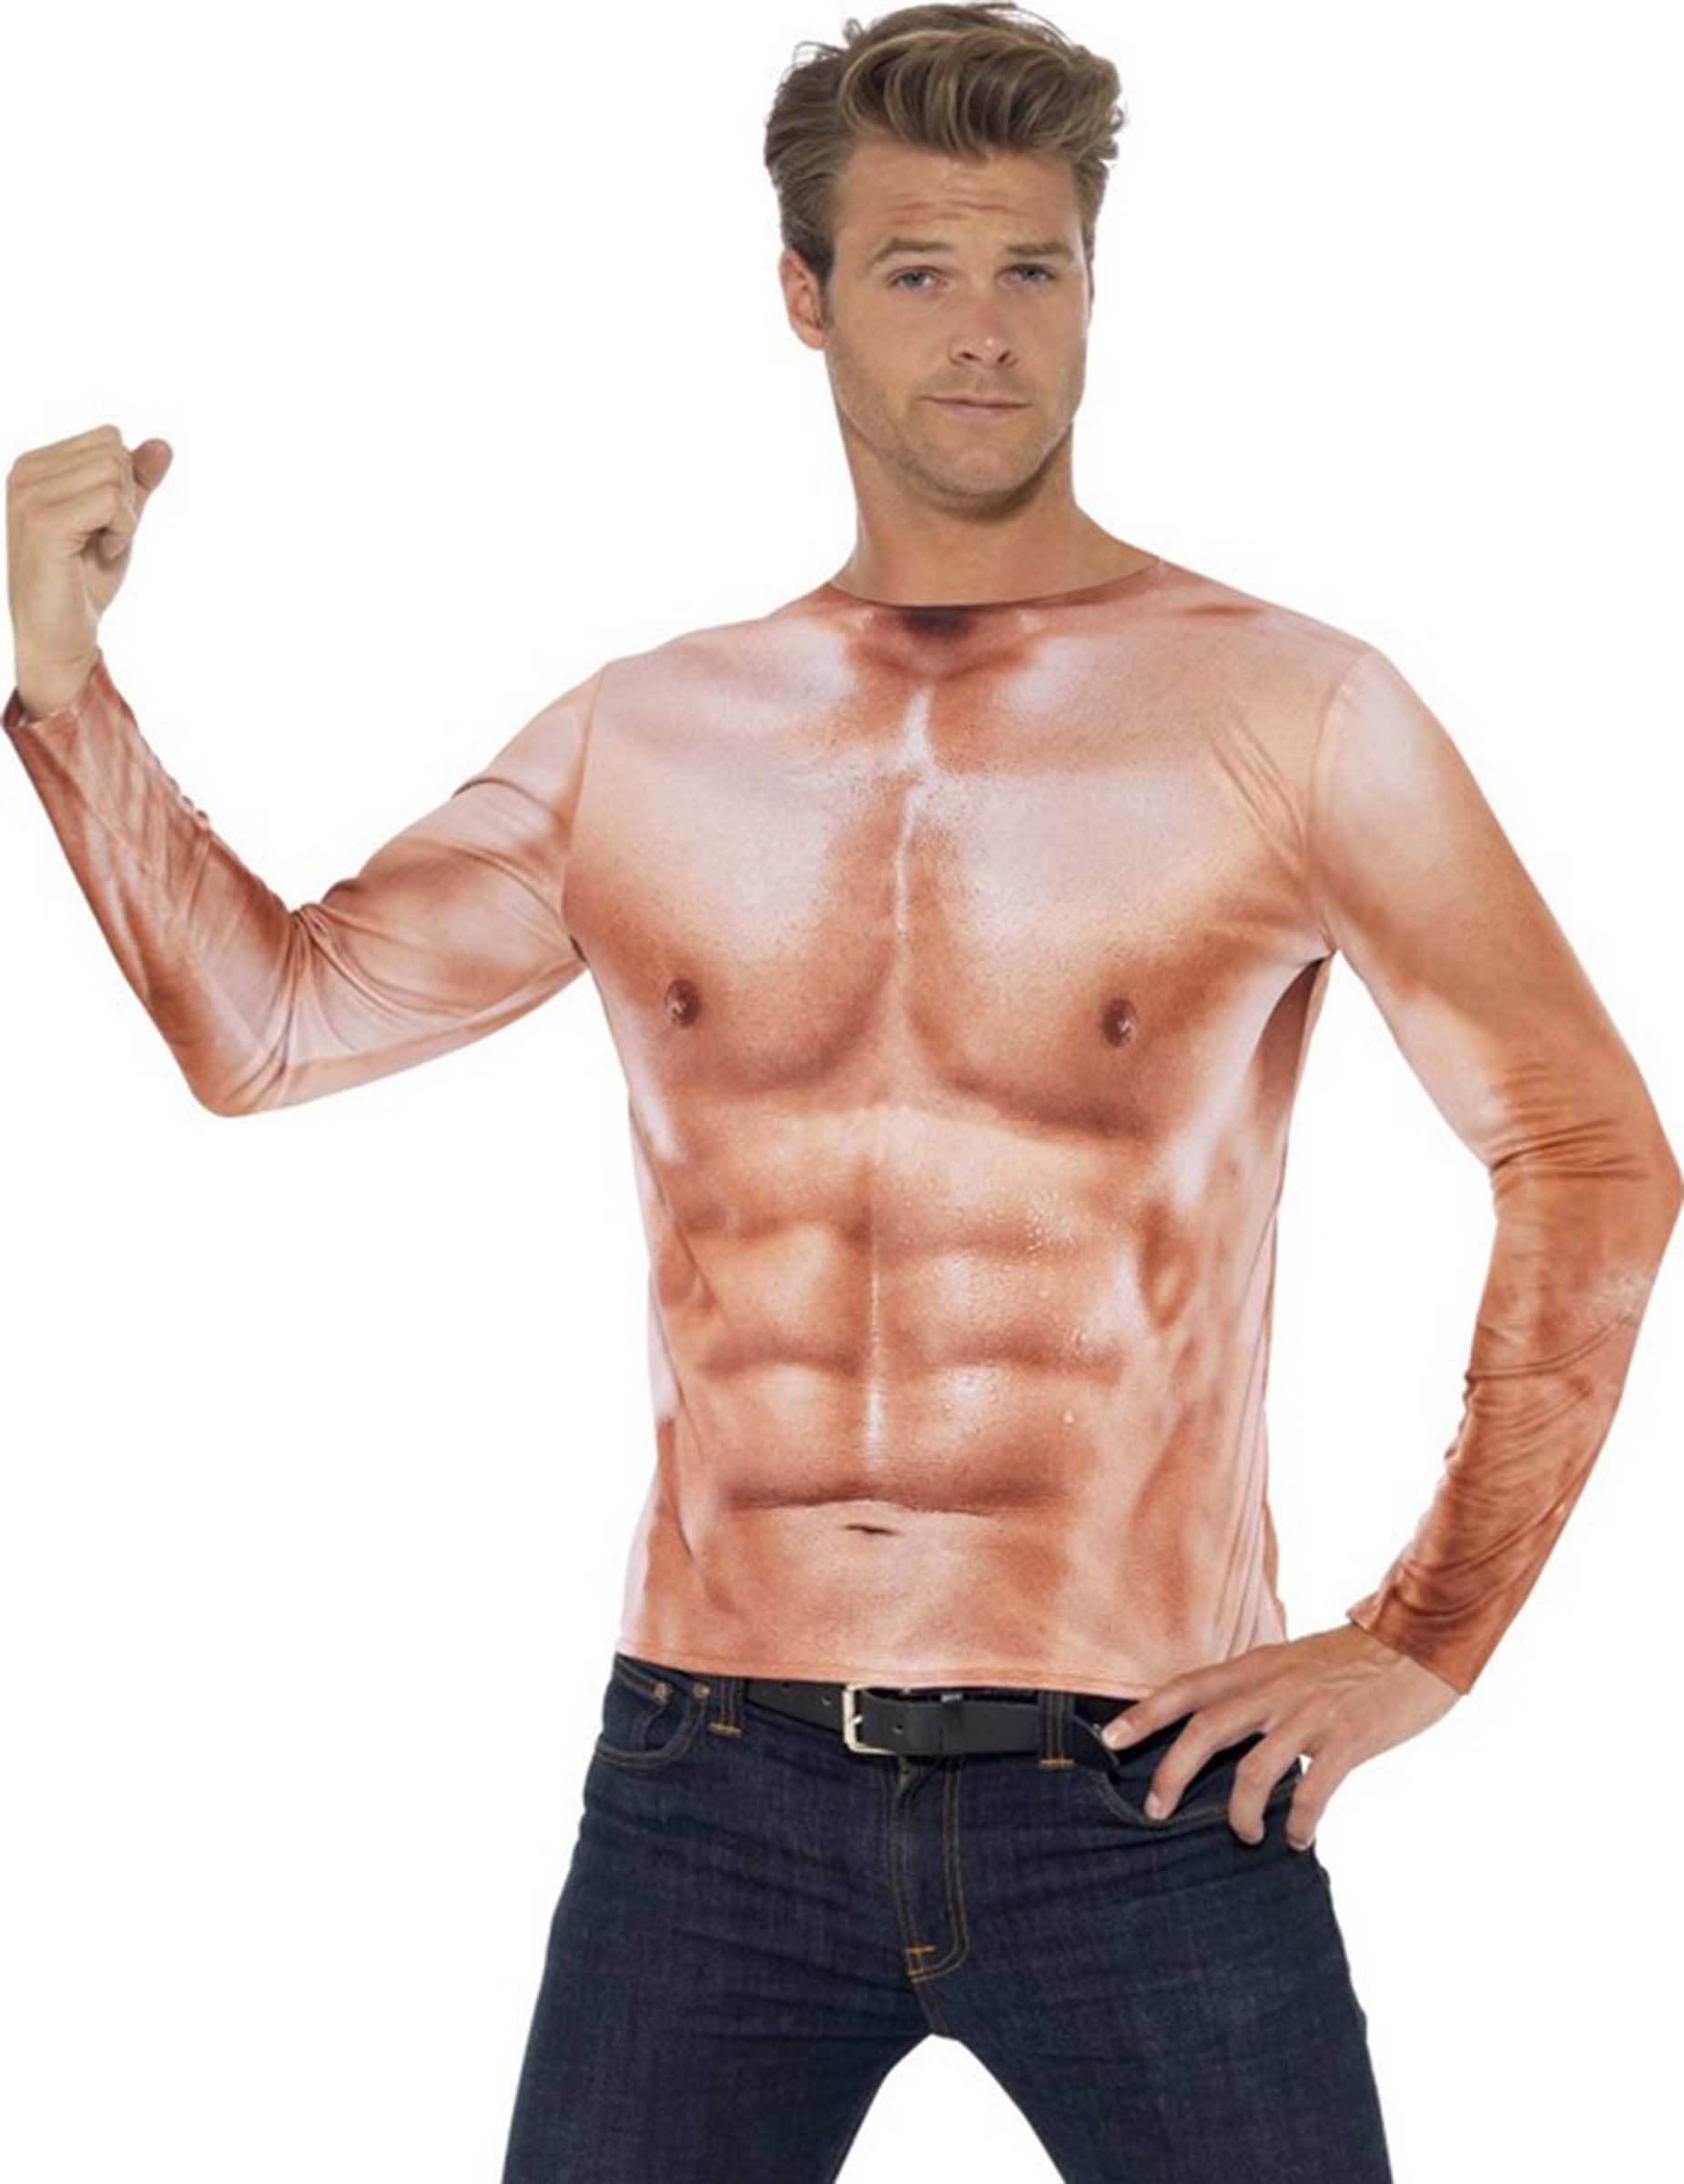 Muscle Bodybuilder Sex 23